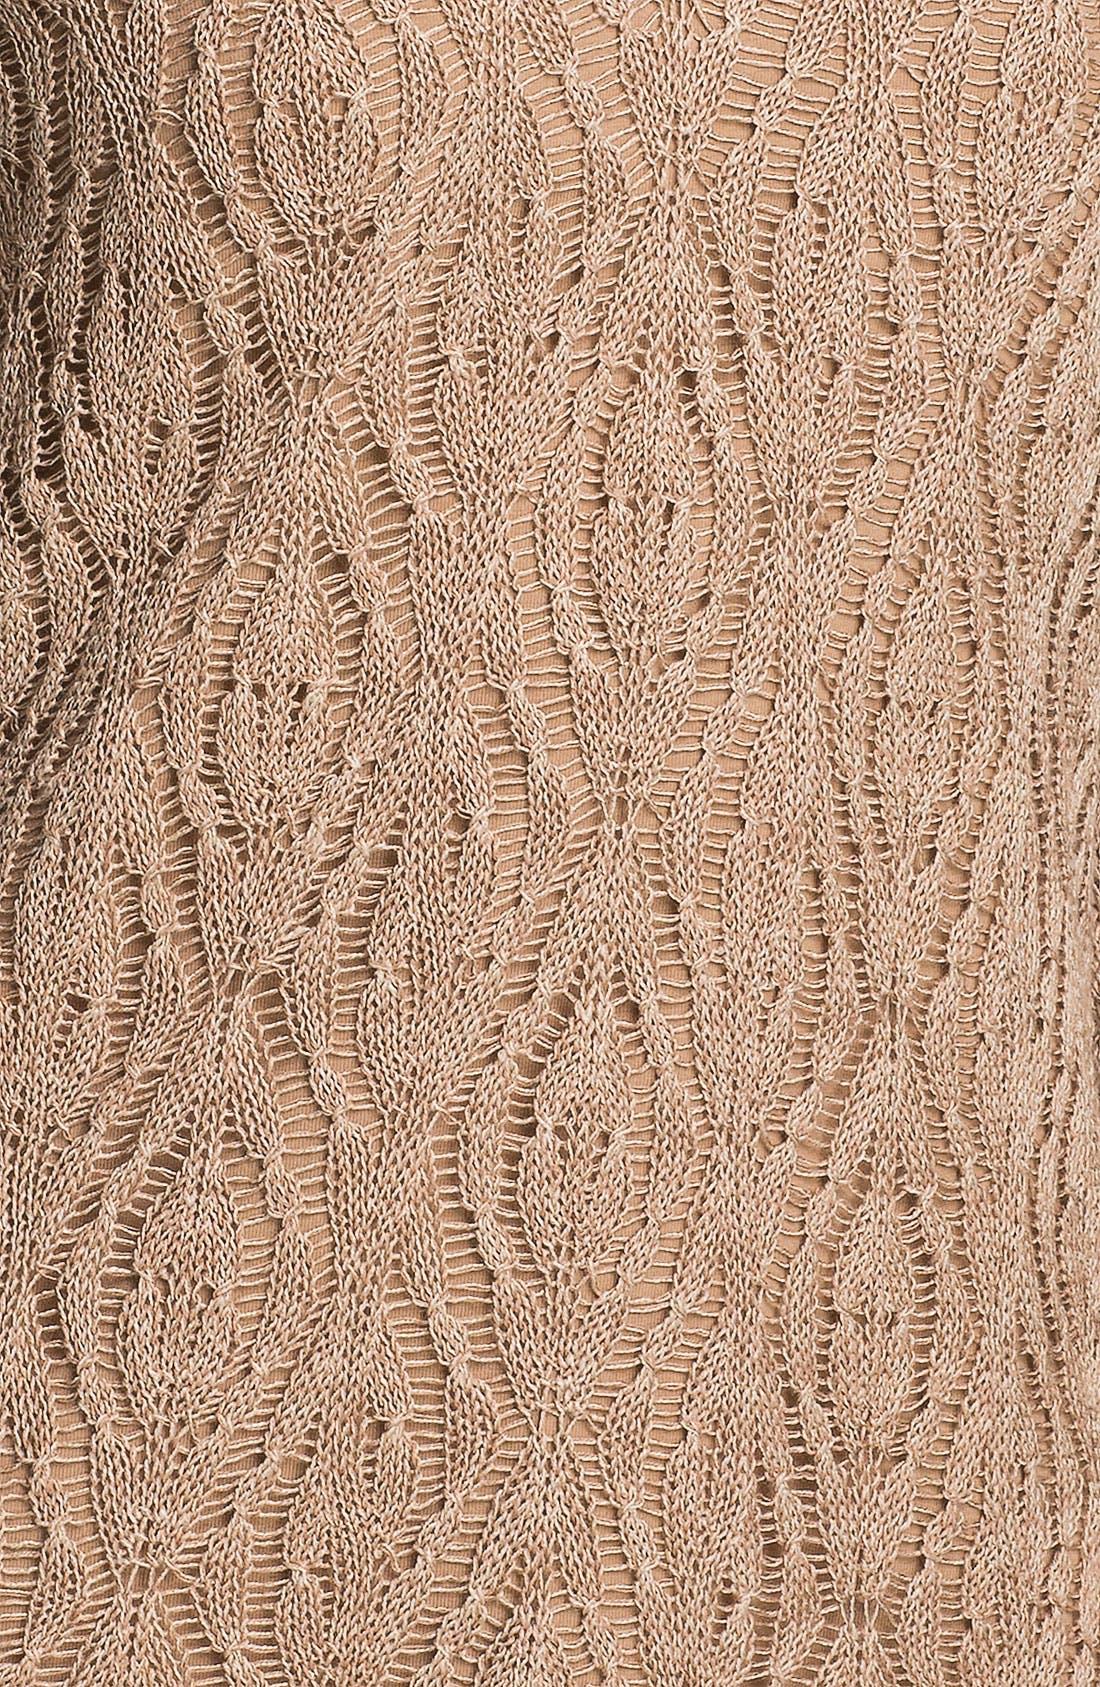 Nic + Zoe 'Starfish' Sweater,                             Alternate thumbnail 3, color,                             250